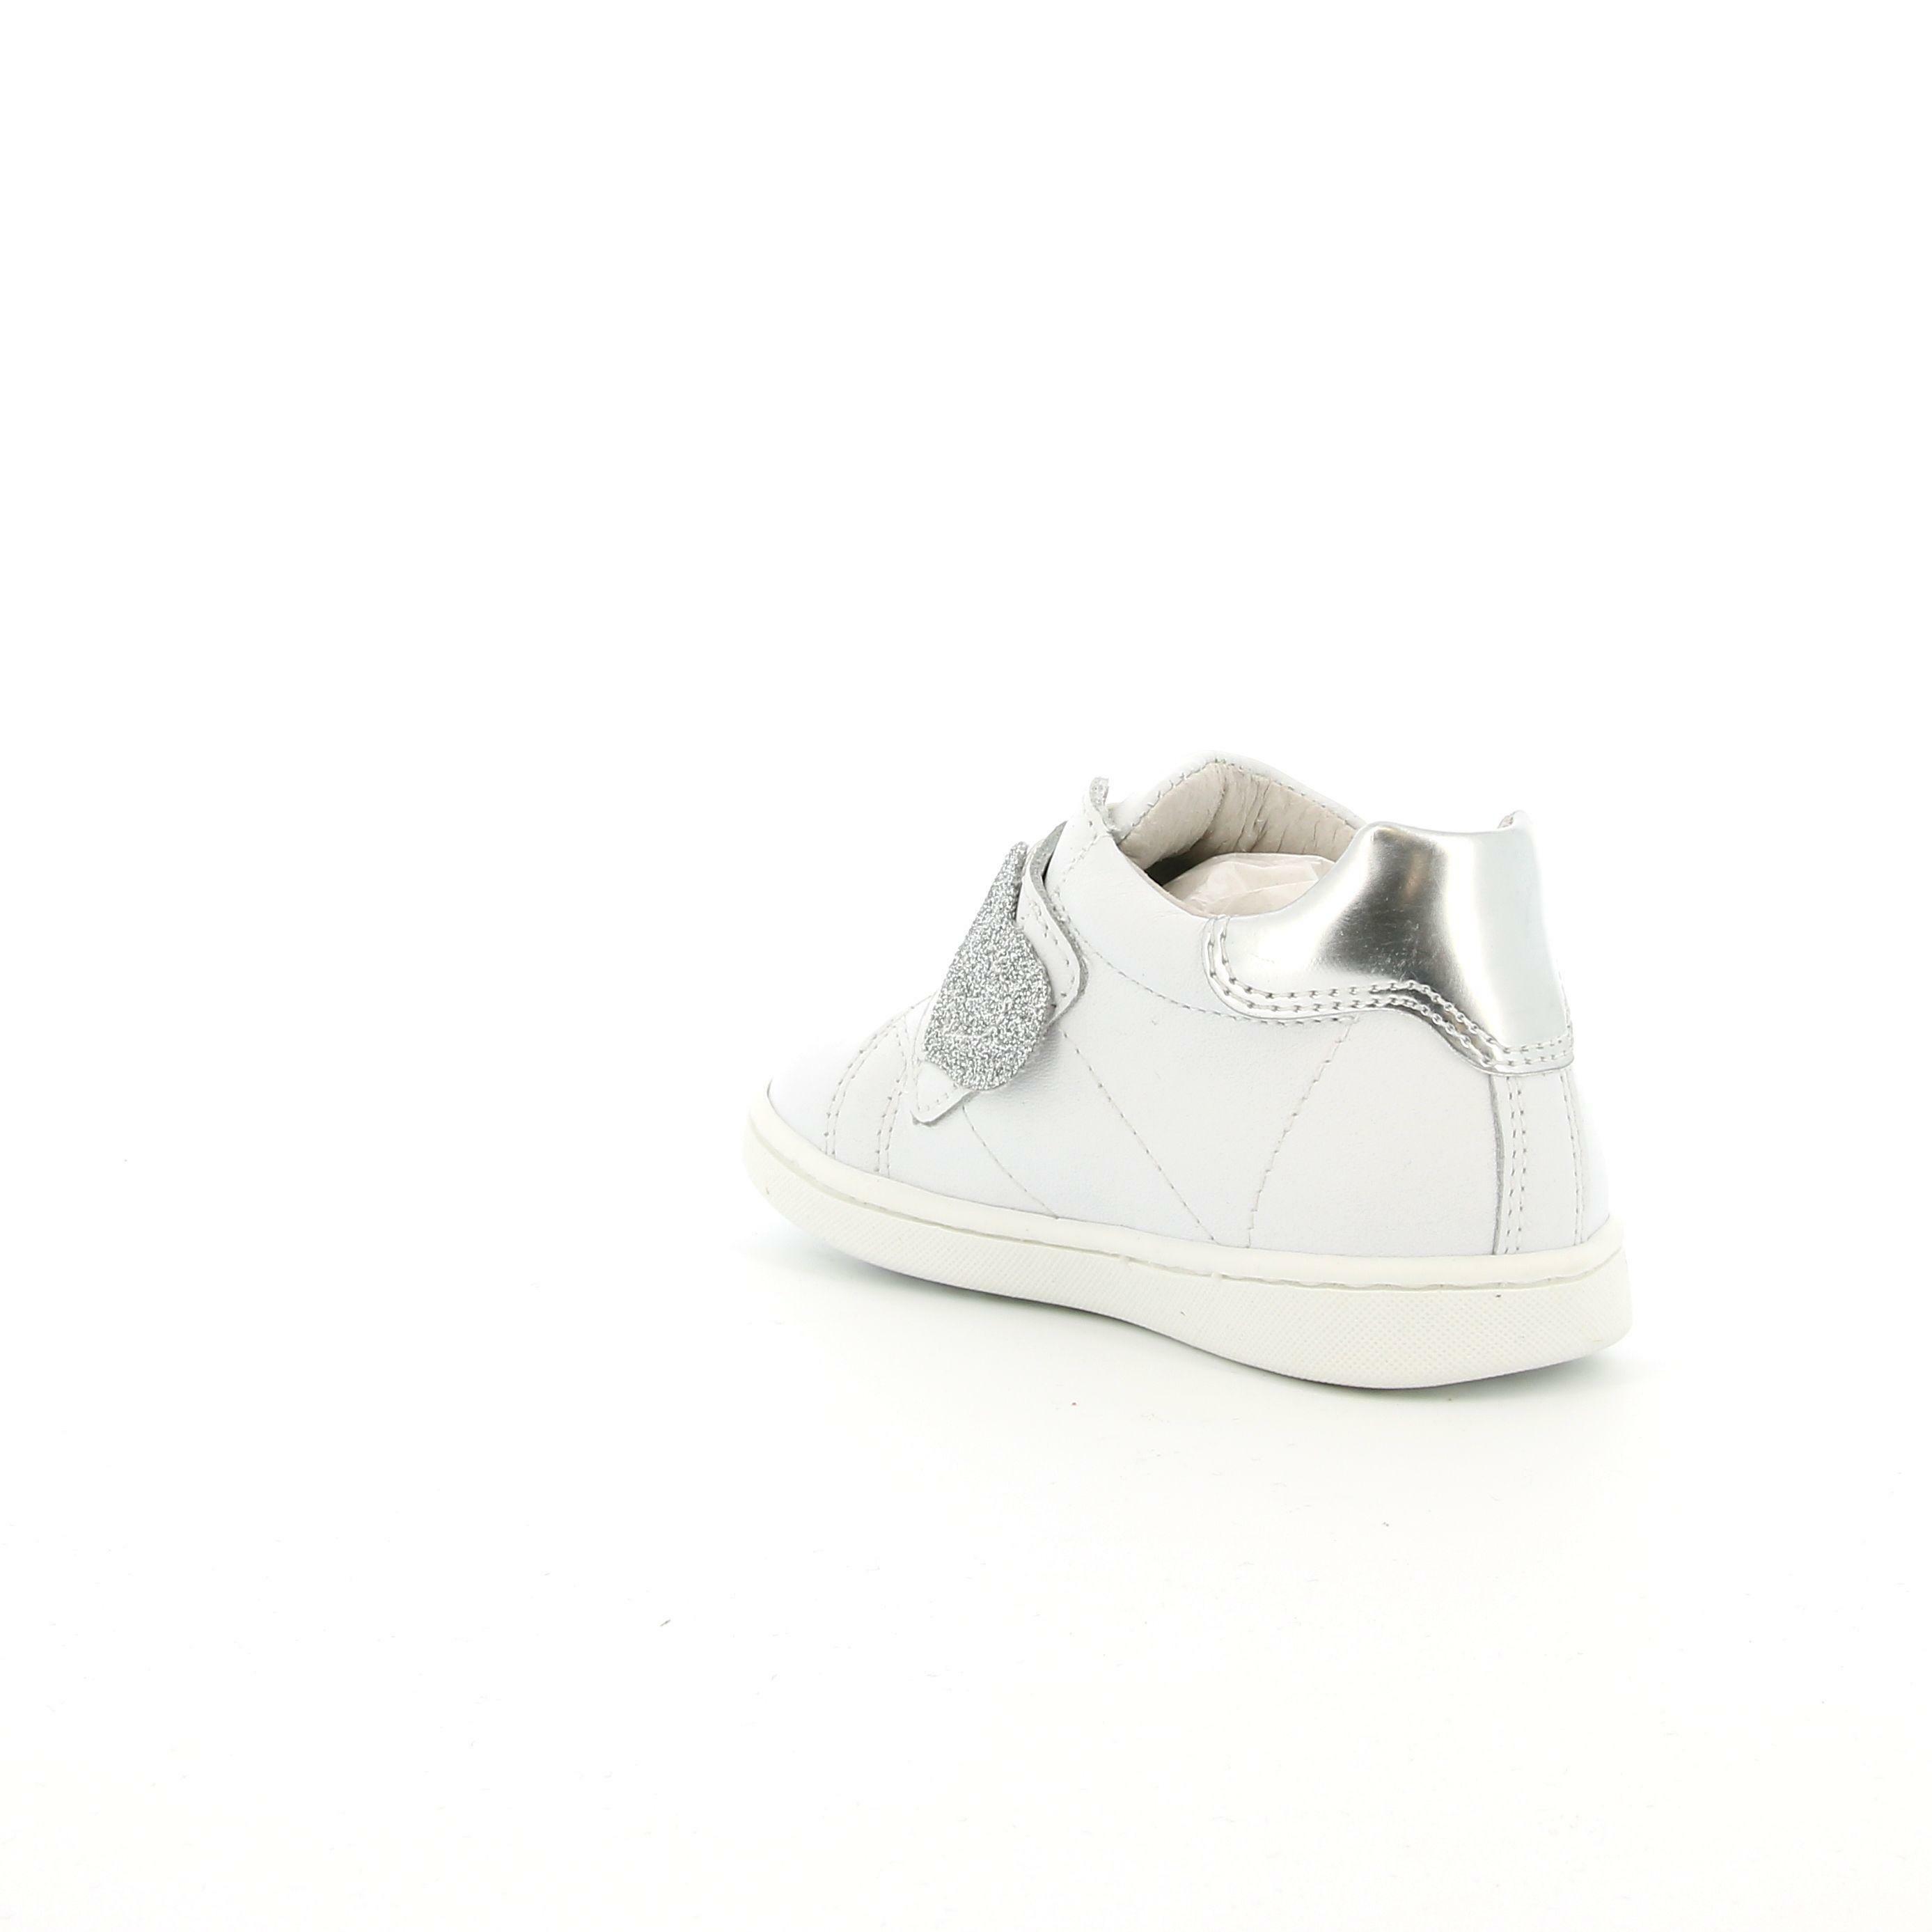 nero giardini nero giardini sneakers bambina e018131f 707 bianco